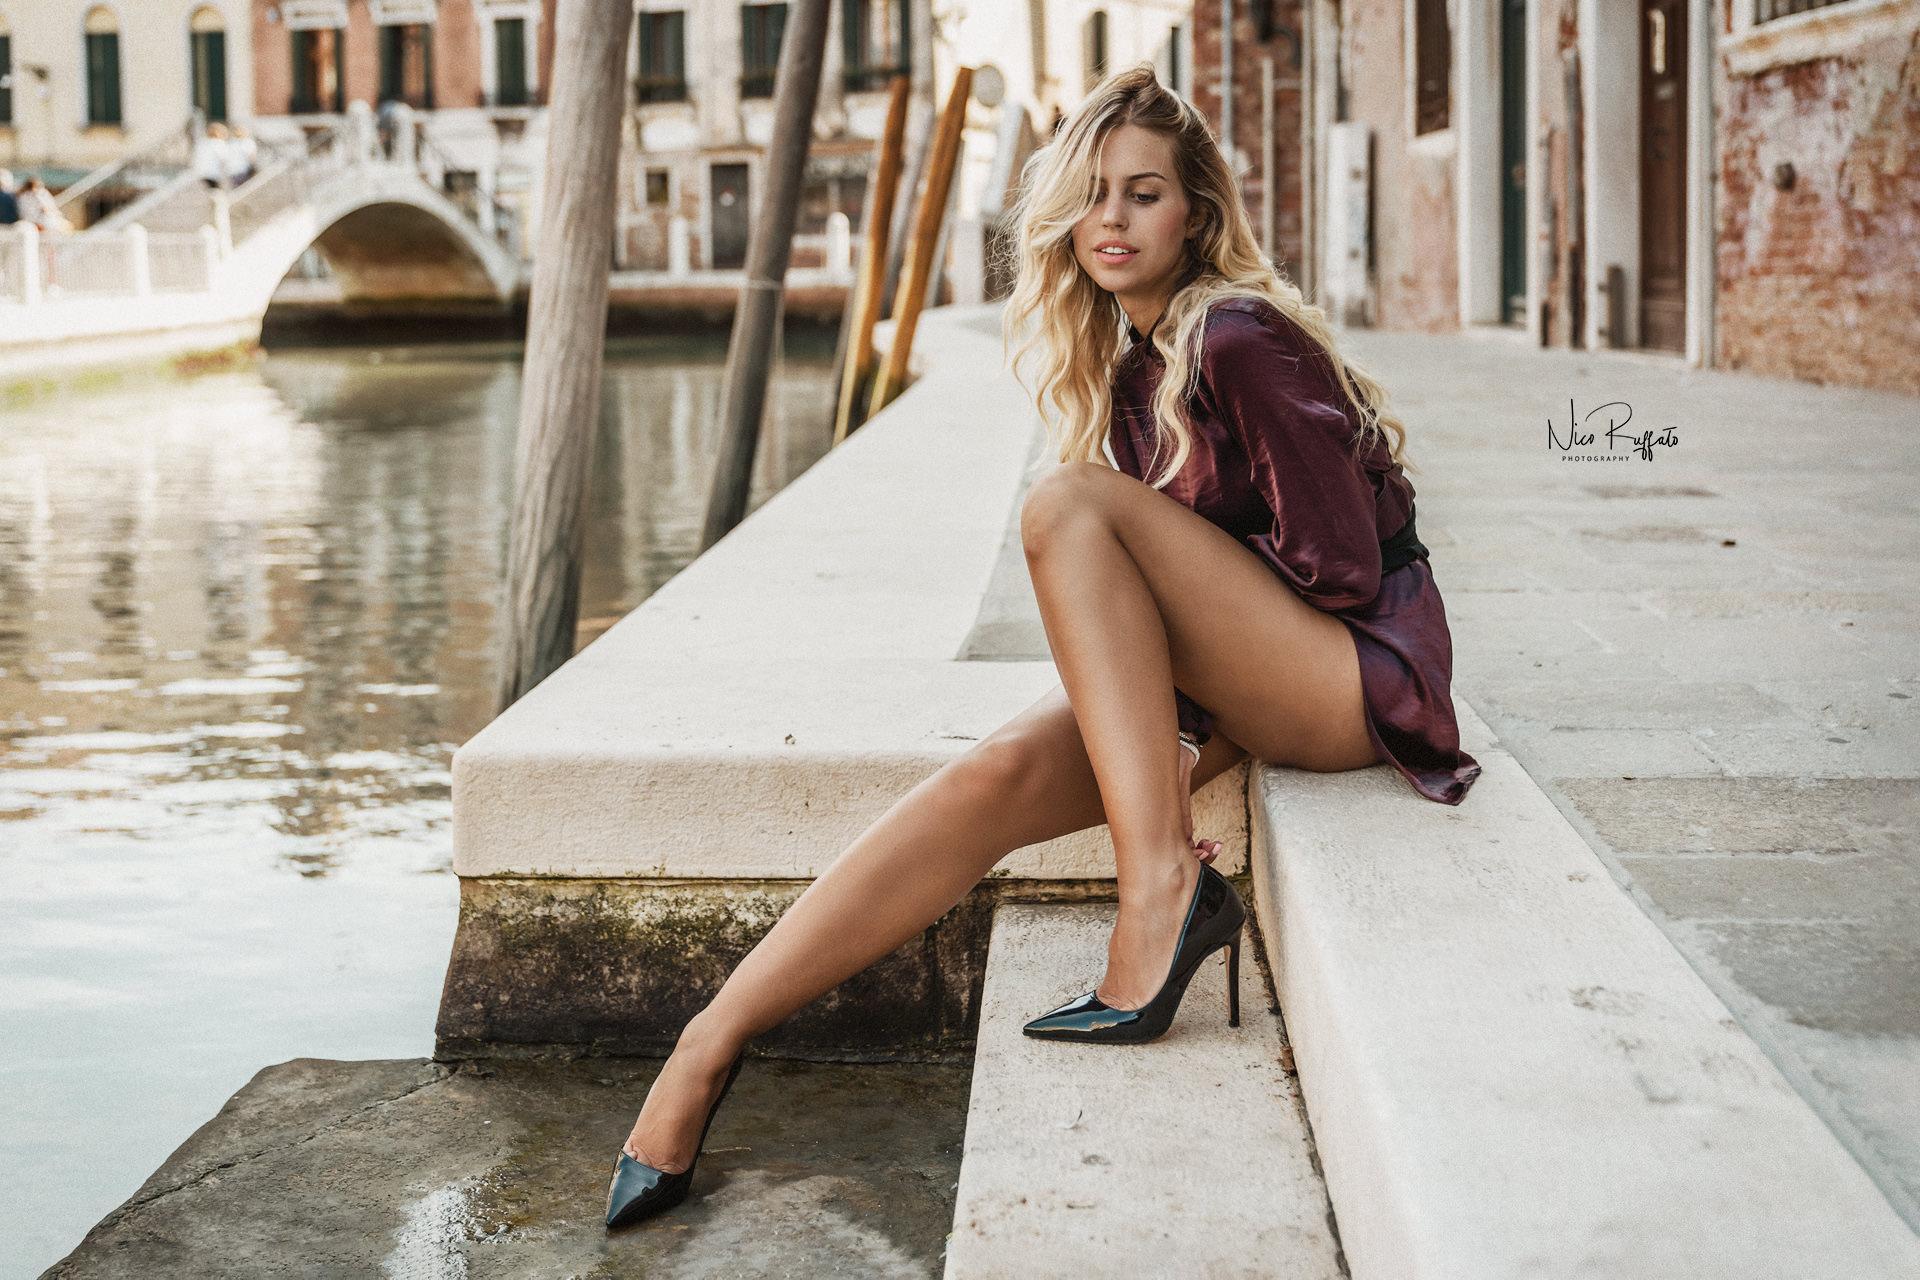 Categorie: Fashion, Glamour, Portrait, Street; Photographer: NICO RUFFATO; Model: SILVIA MENEGHINI; Location: Venezia, VE, Italia